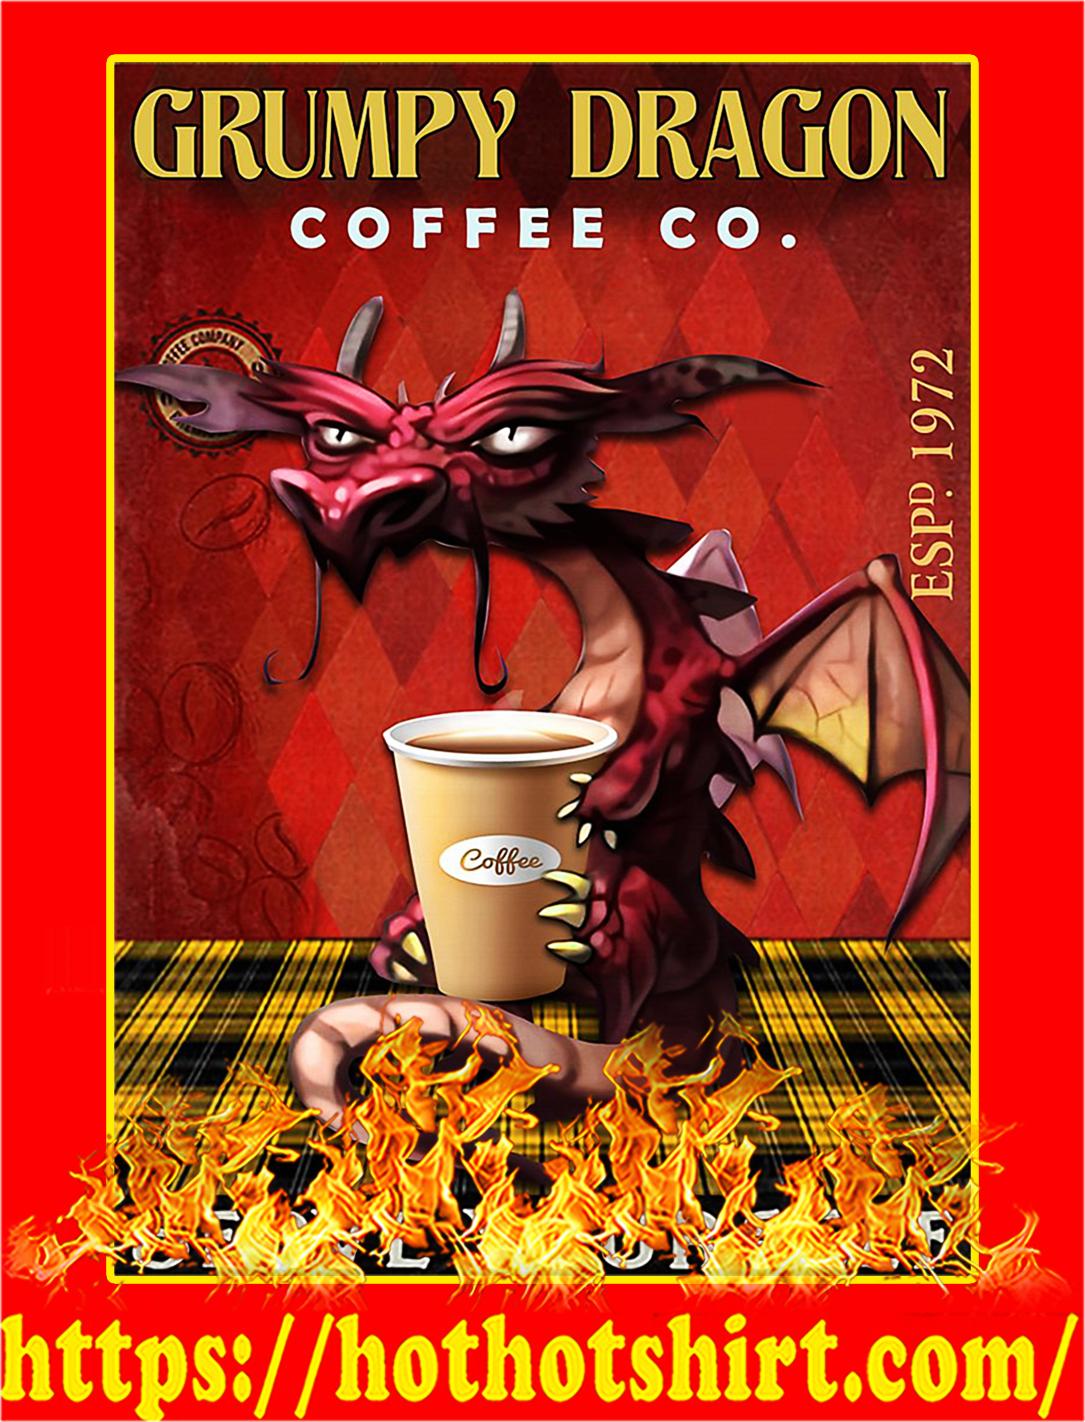 Grumpy Dragon Coffee Co Poster - A1